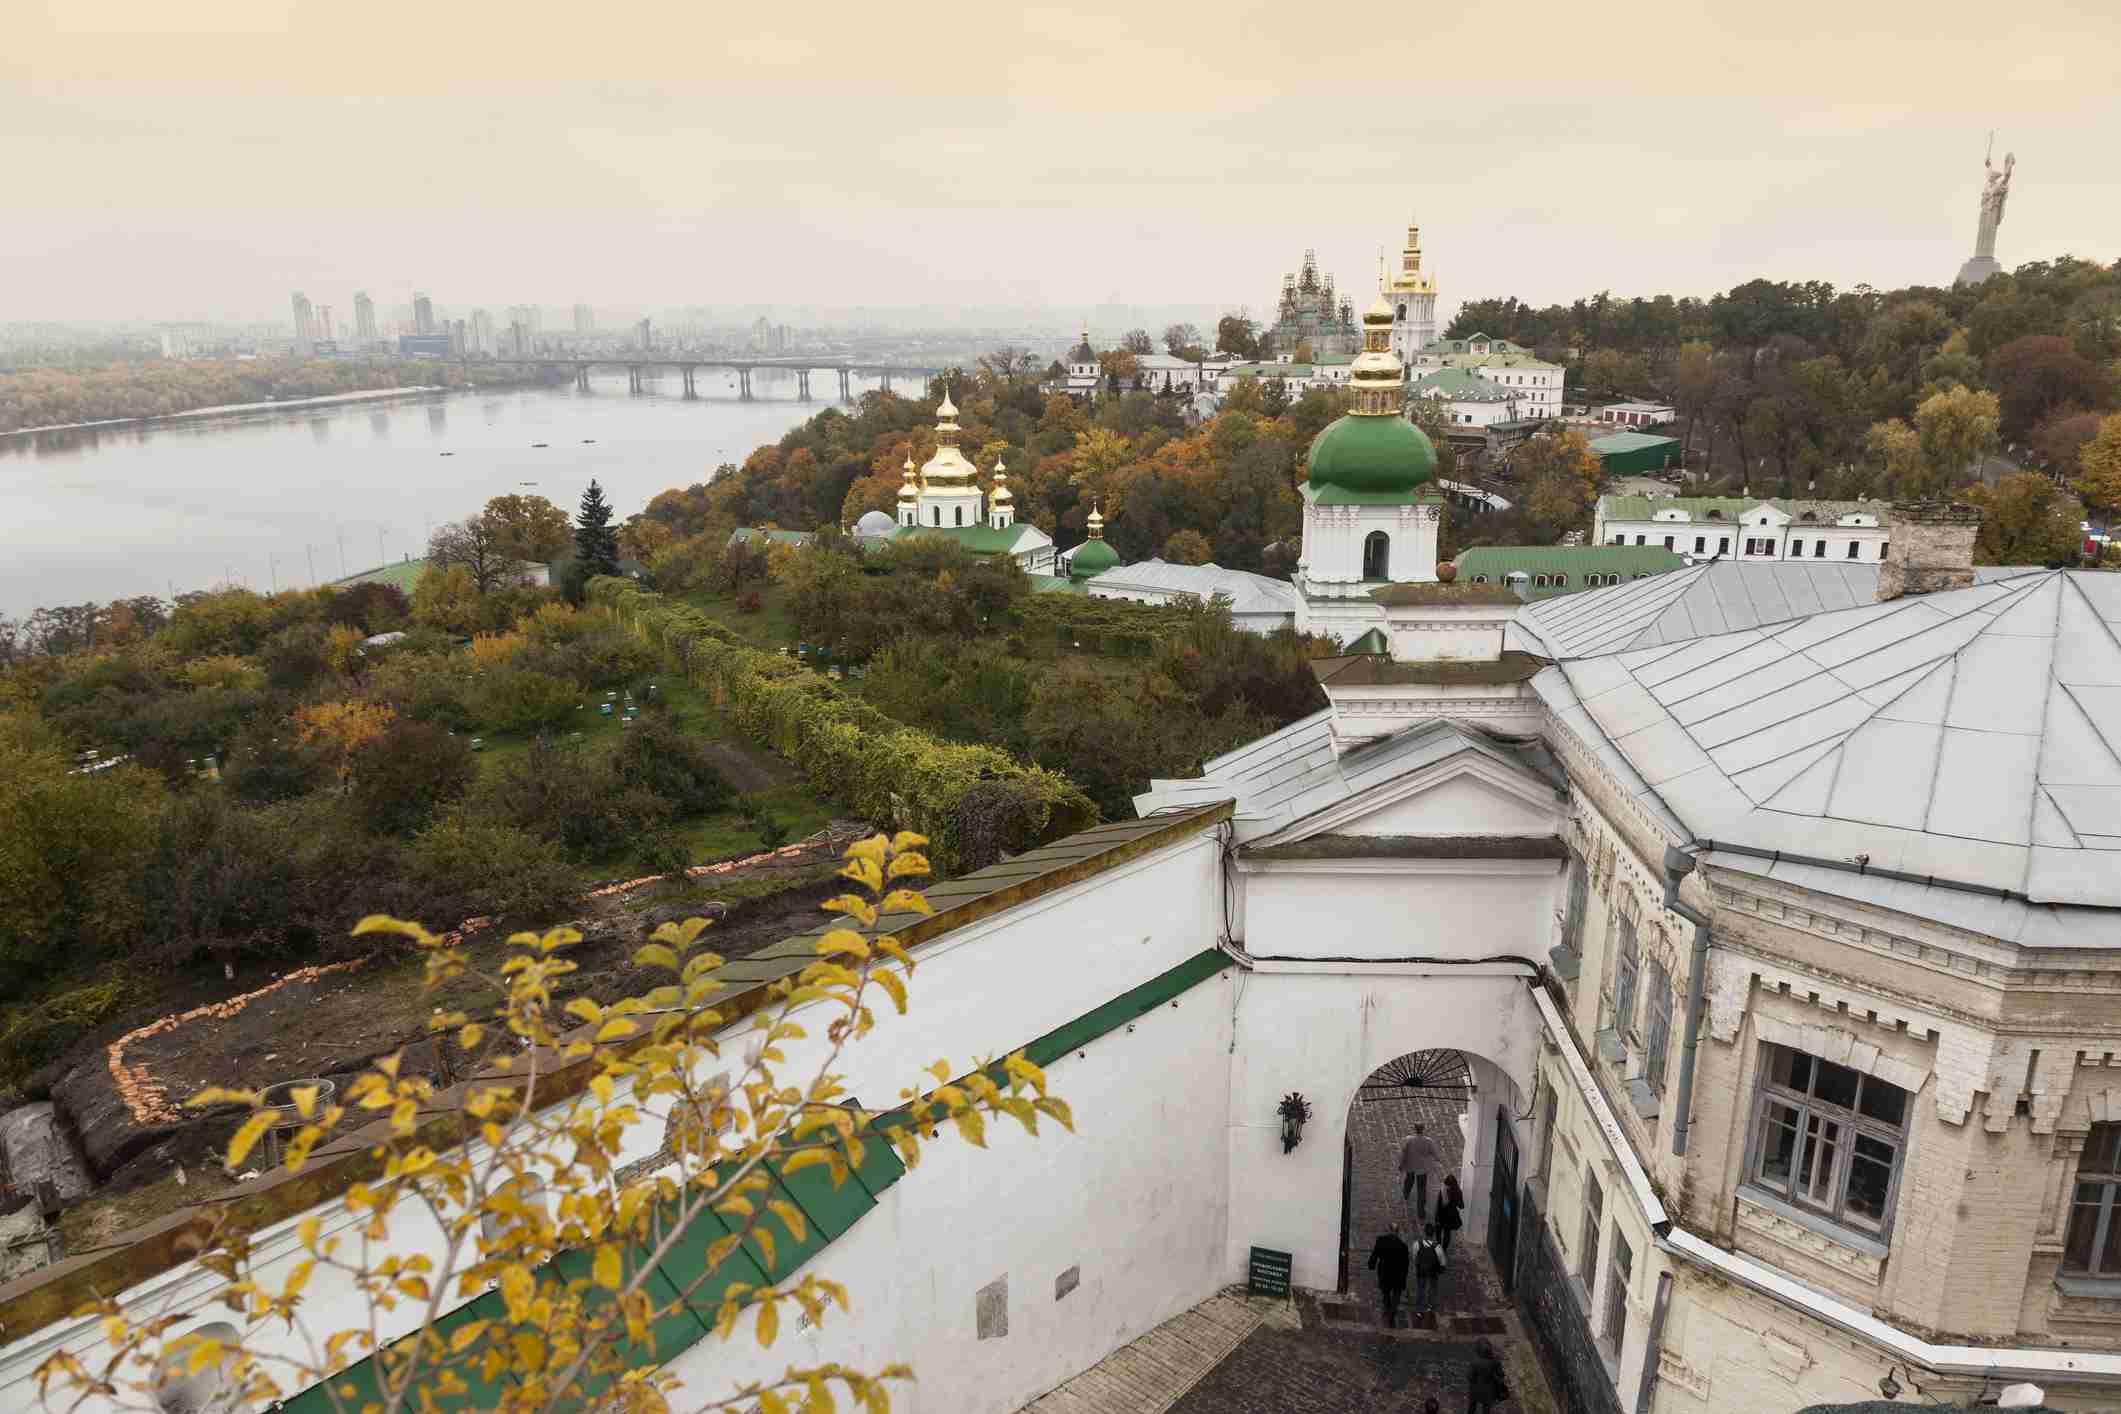 kyiv-pechersk lavra and dnipro river